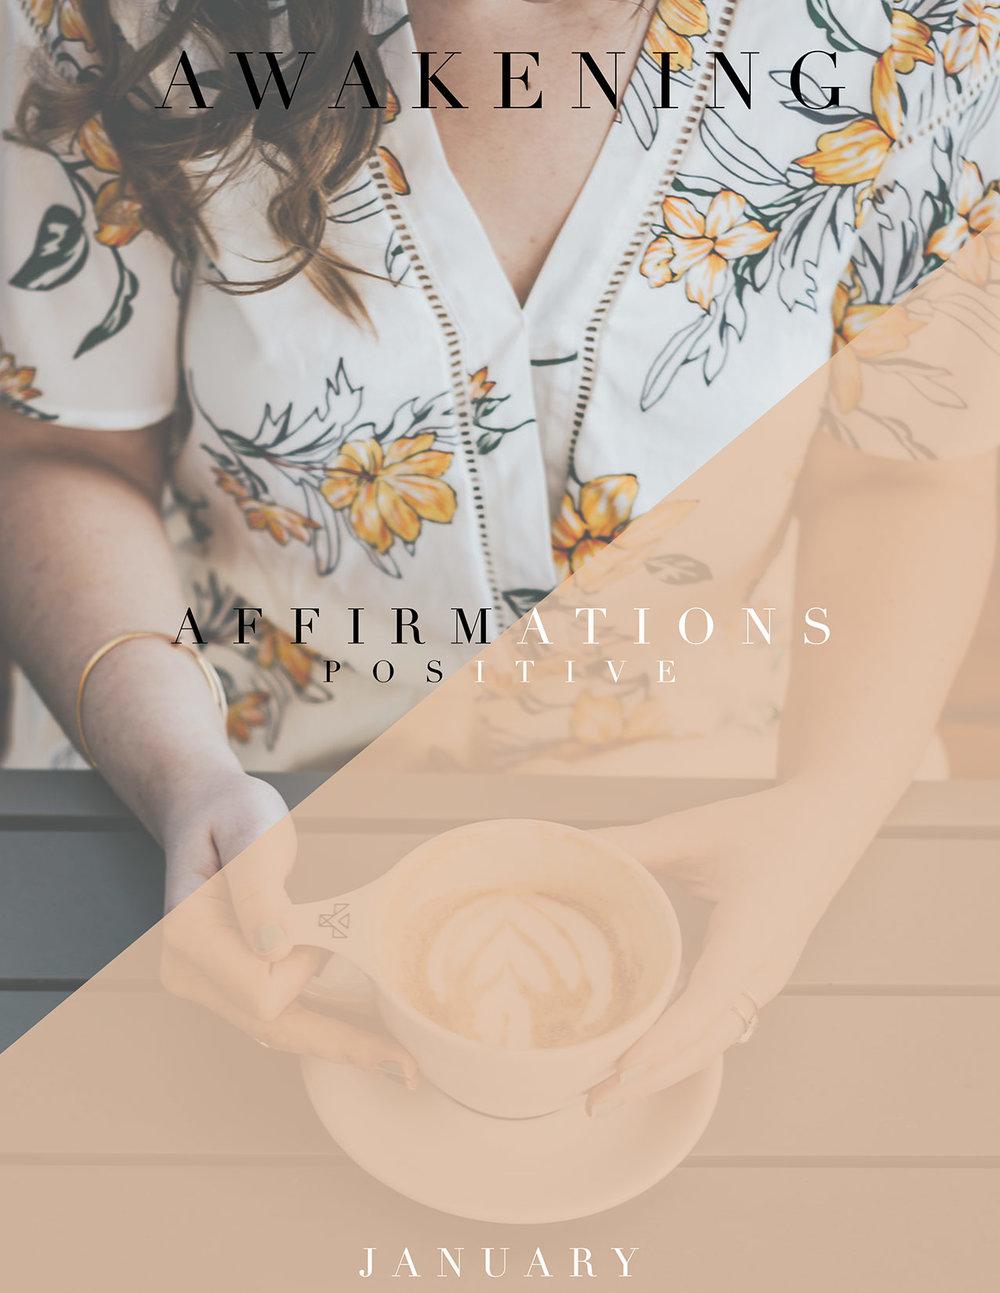 2019 - January Affirmations